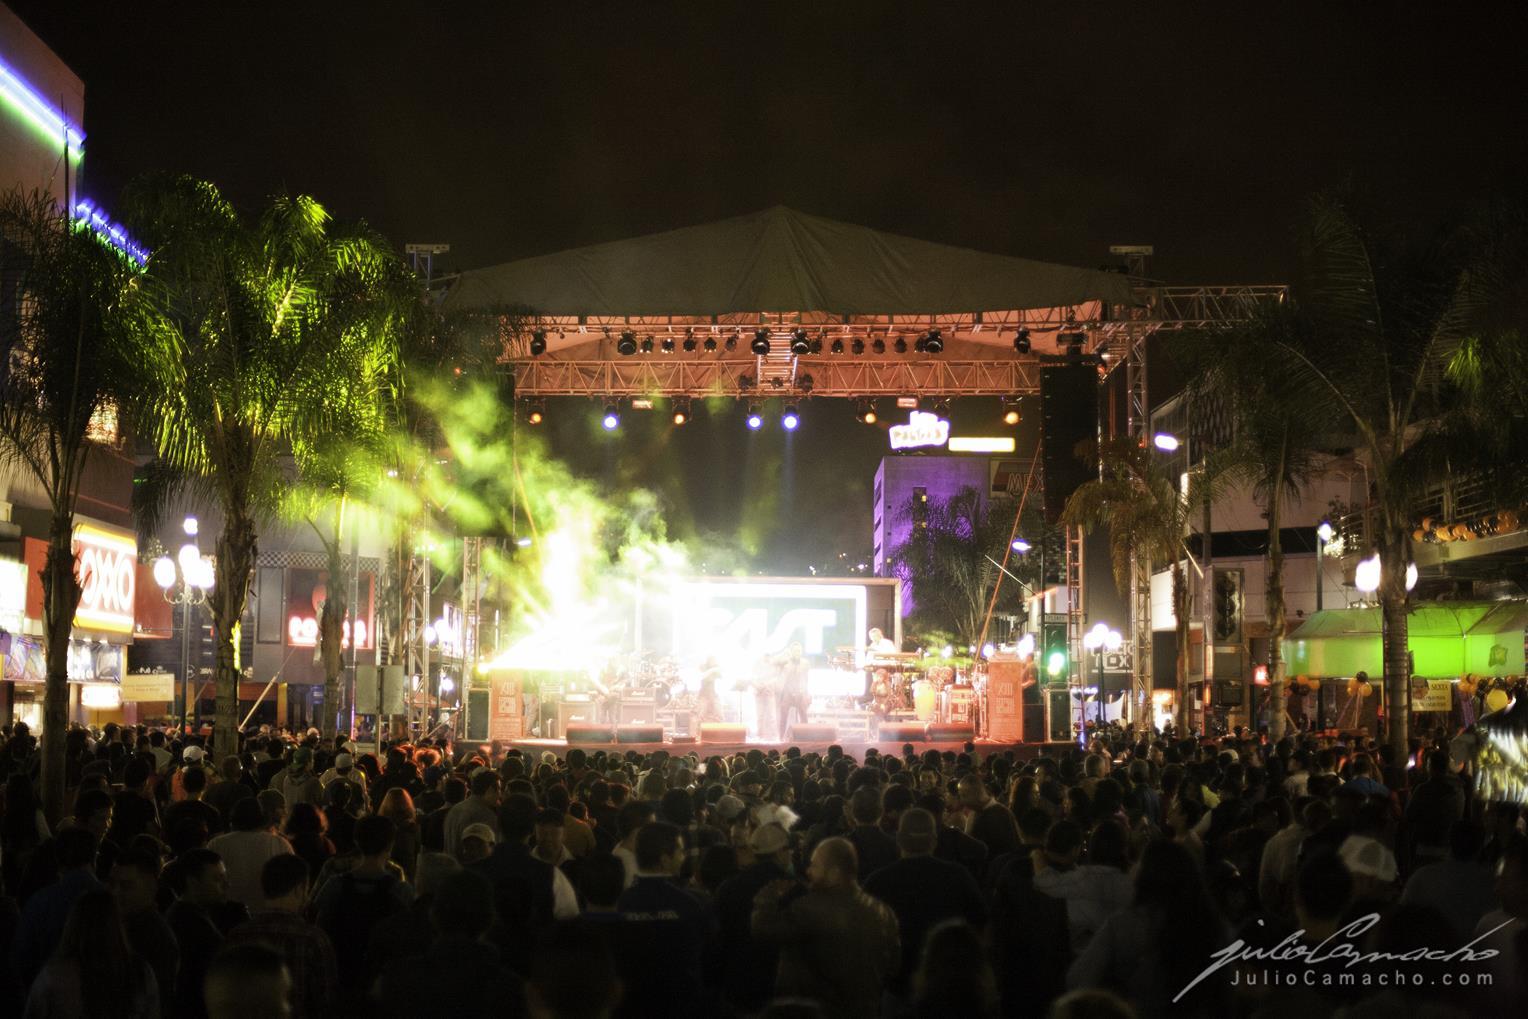 2014-10-30 31 CAST TOUR Ensenada y Tijuana - 1488 - www.Juli (Copy).jpg